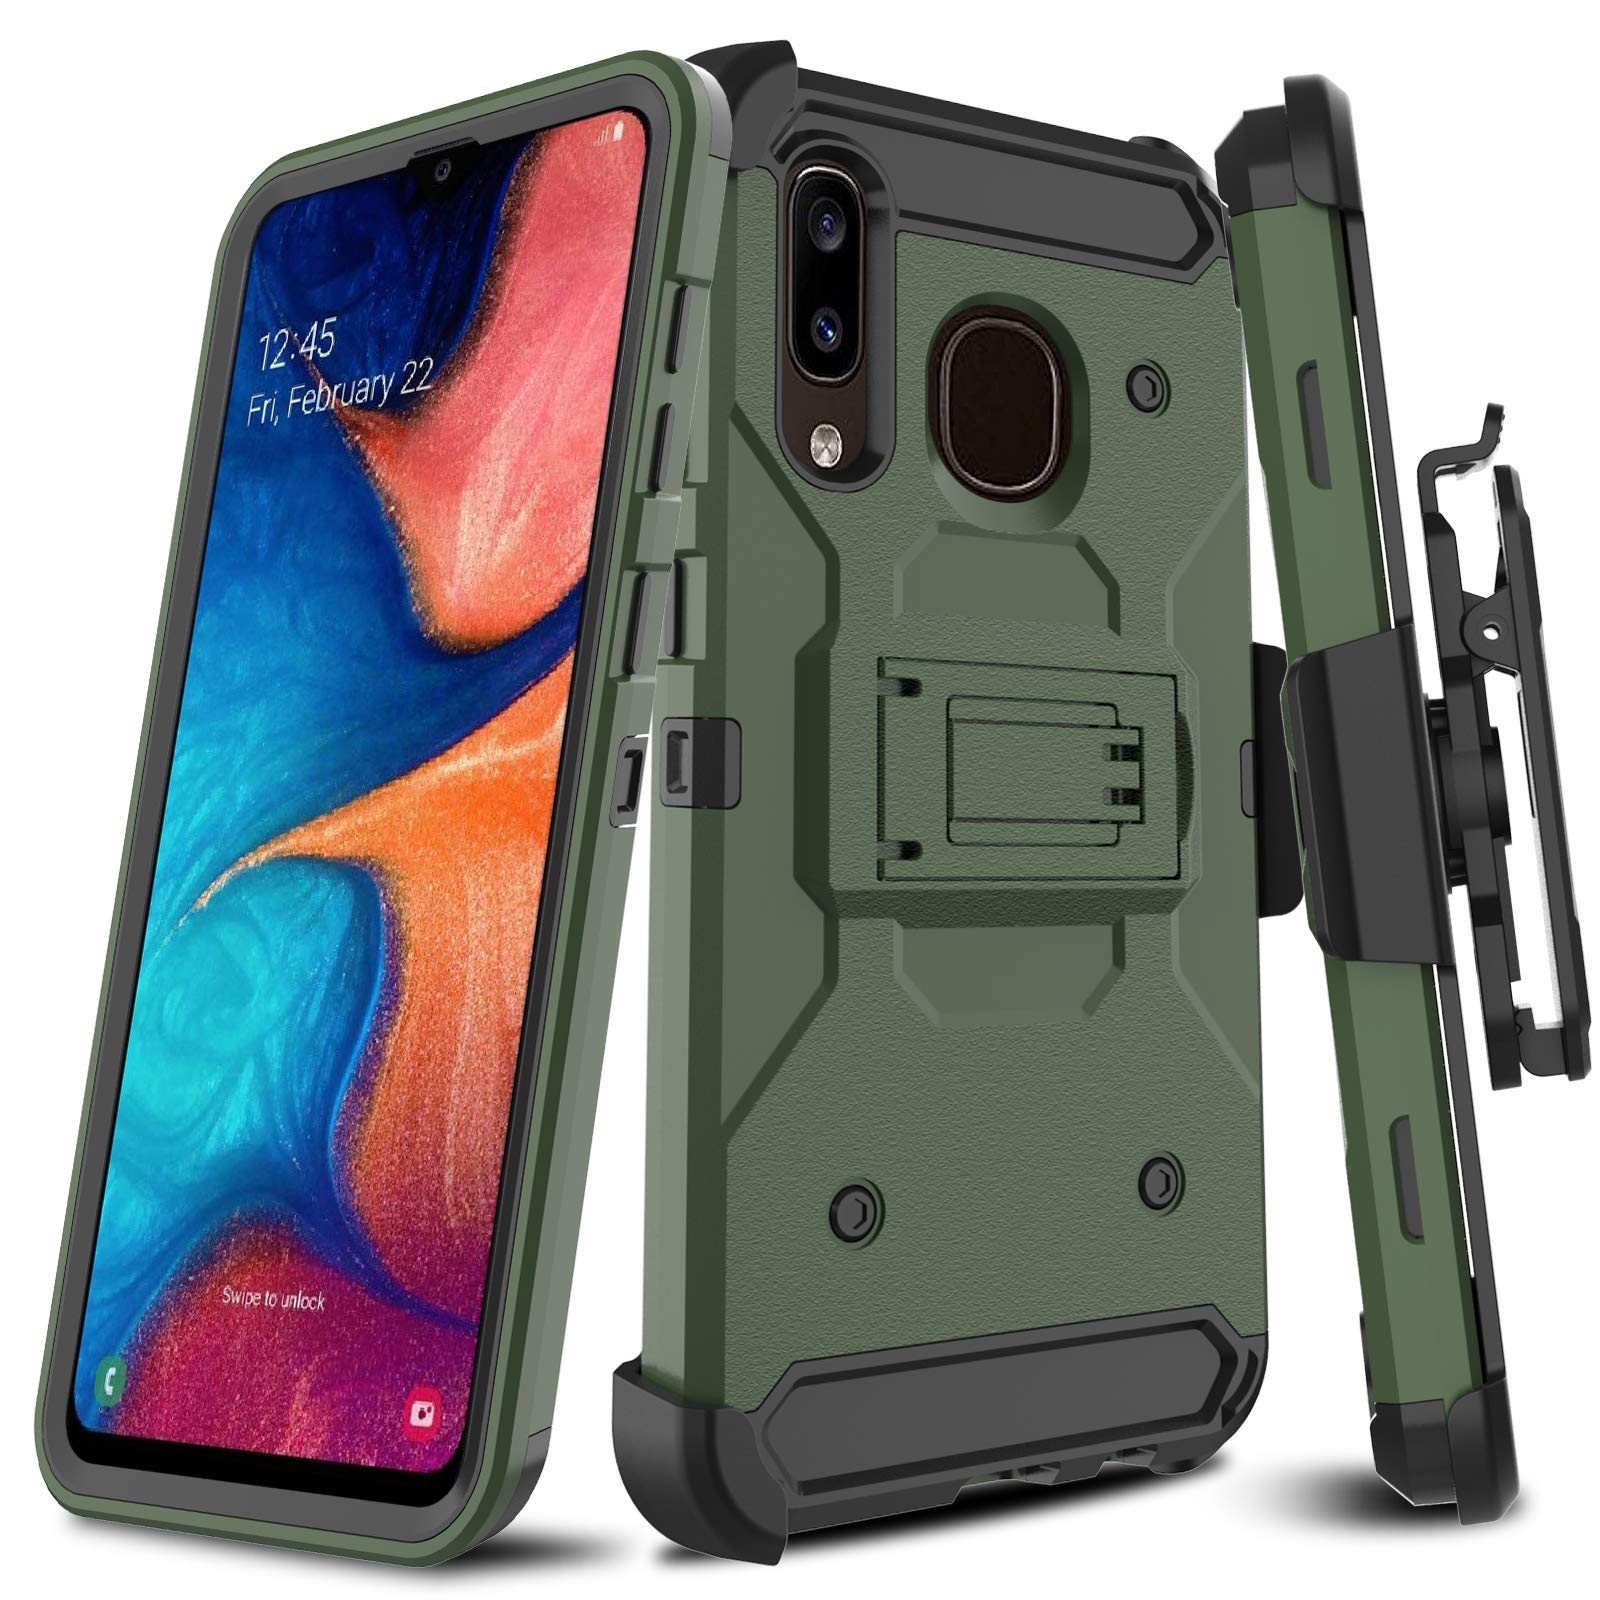 Funda Para Samsung Galaxy A20 / A30 / A50 Con Pie Leptech [7vp62dyz]